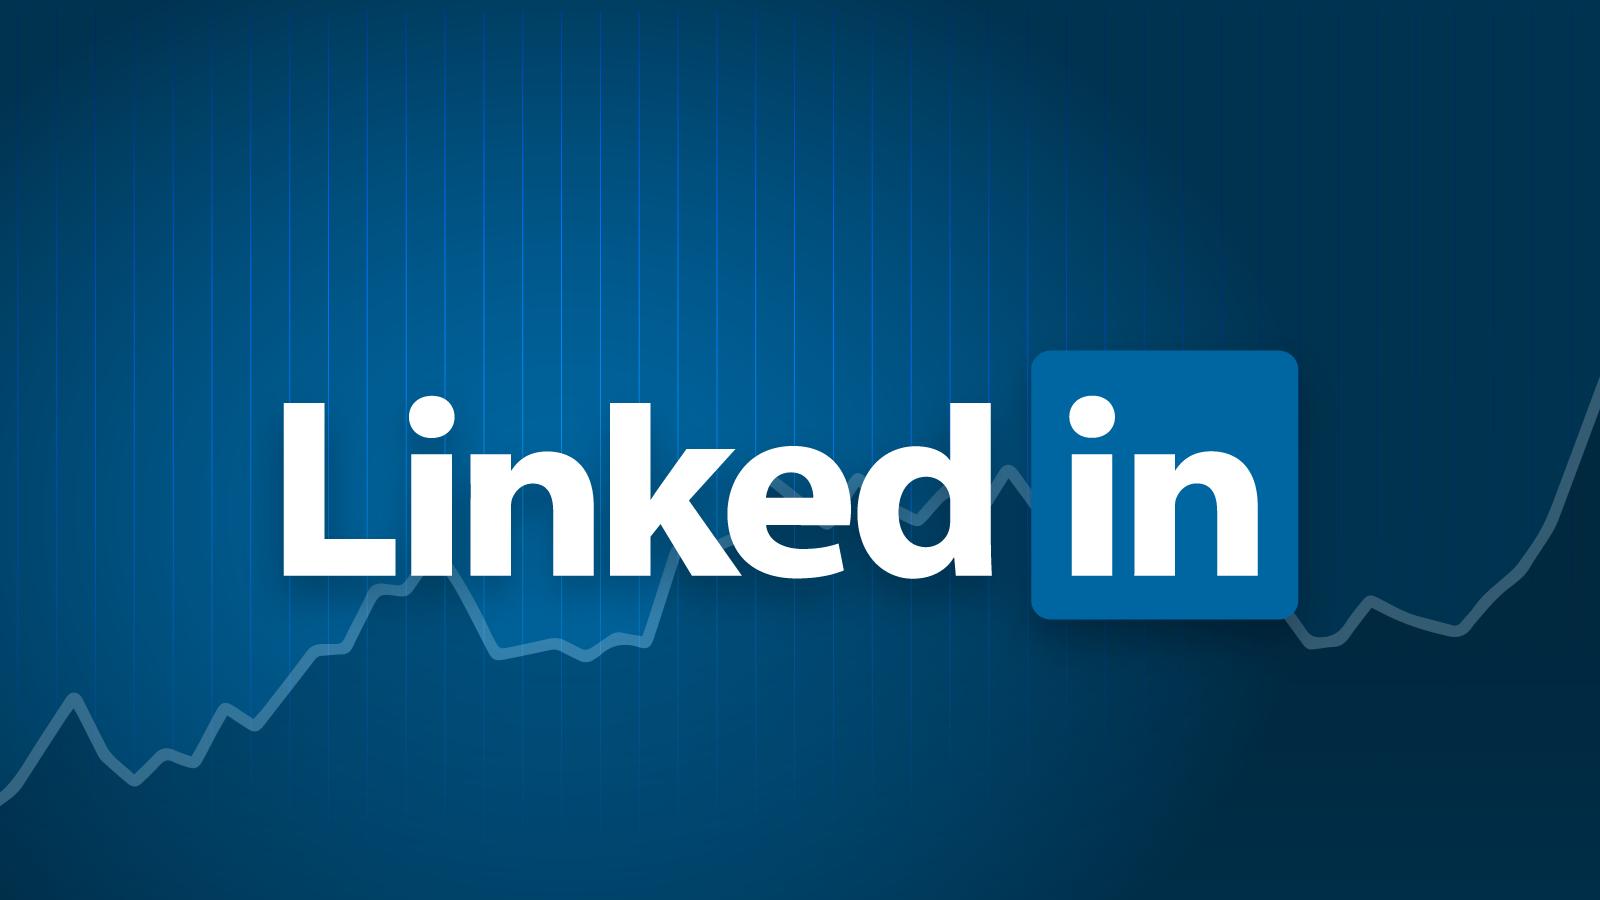 Smm-специалист LinkedIn